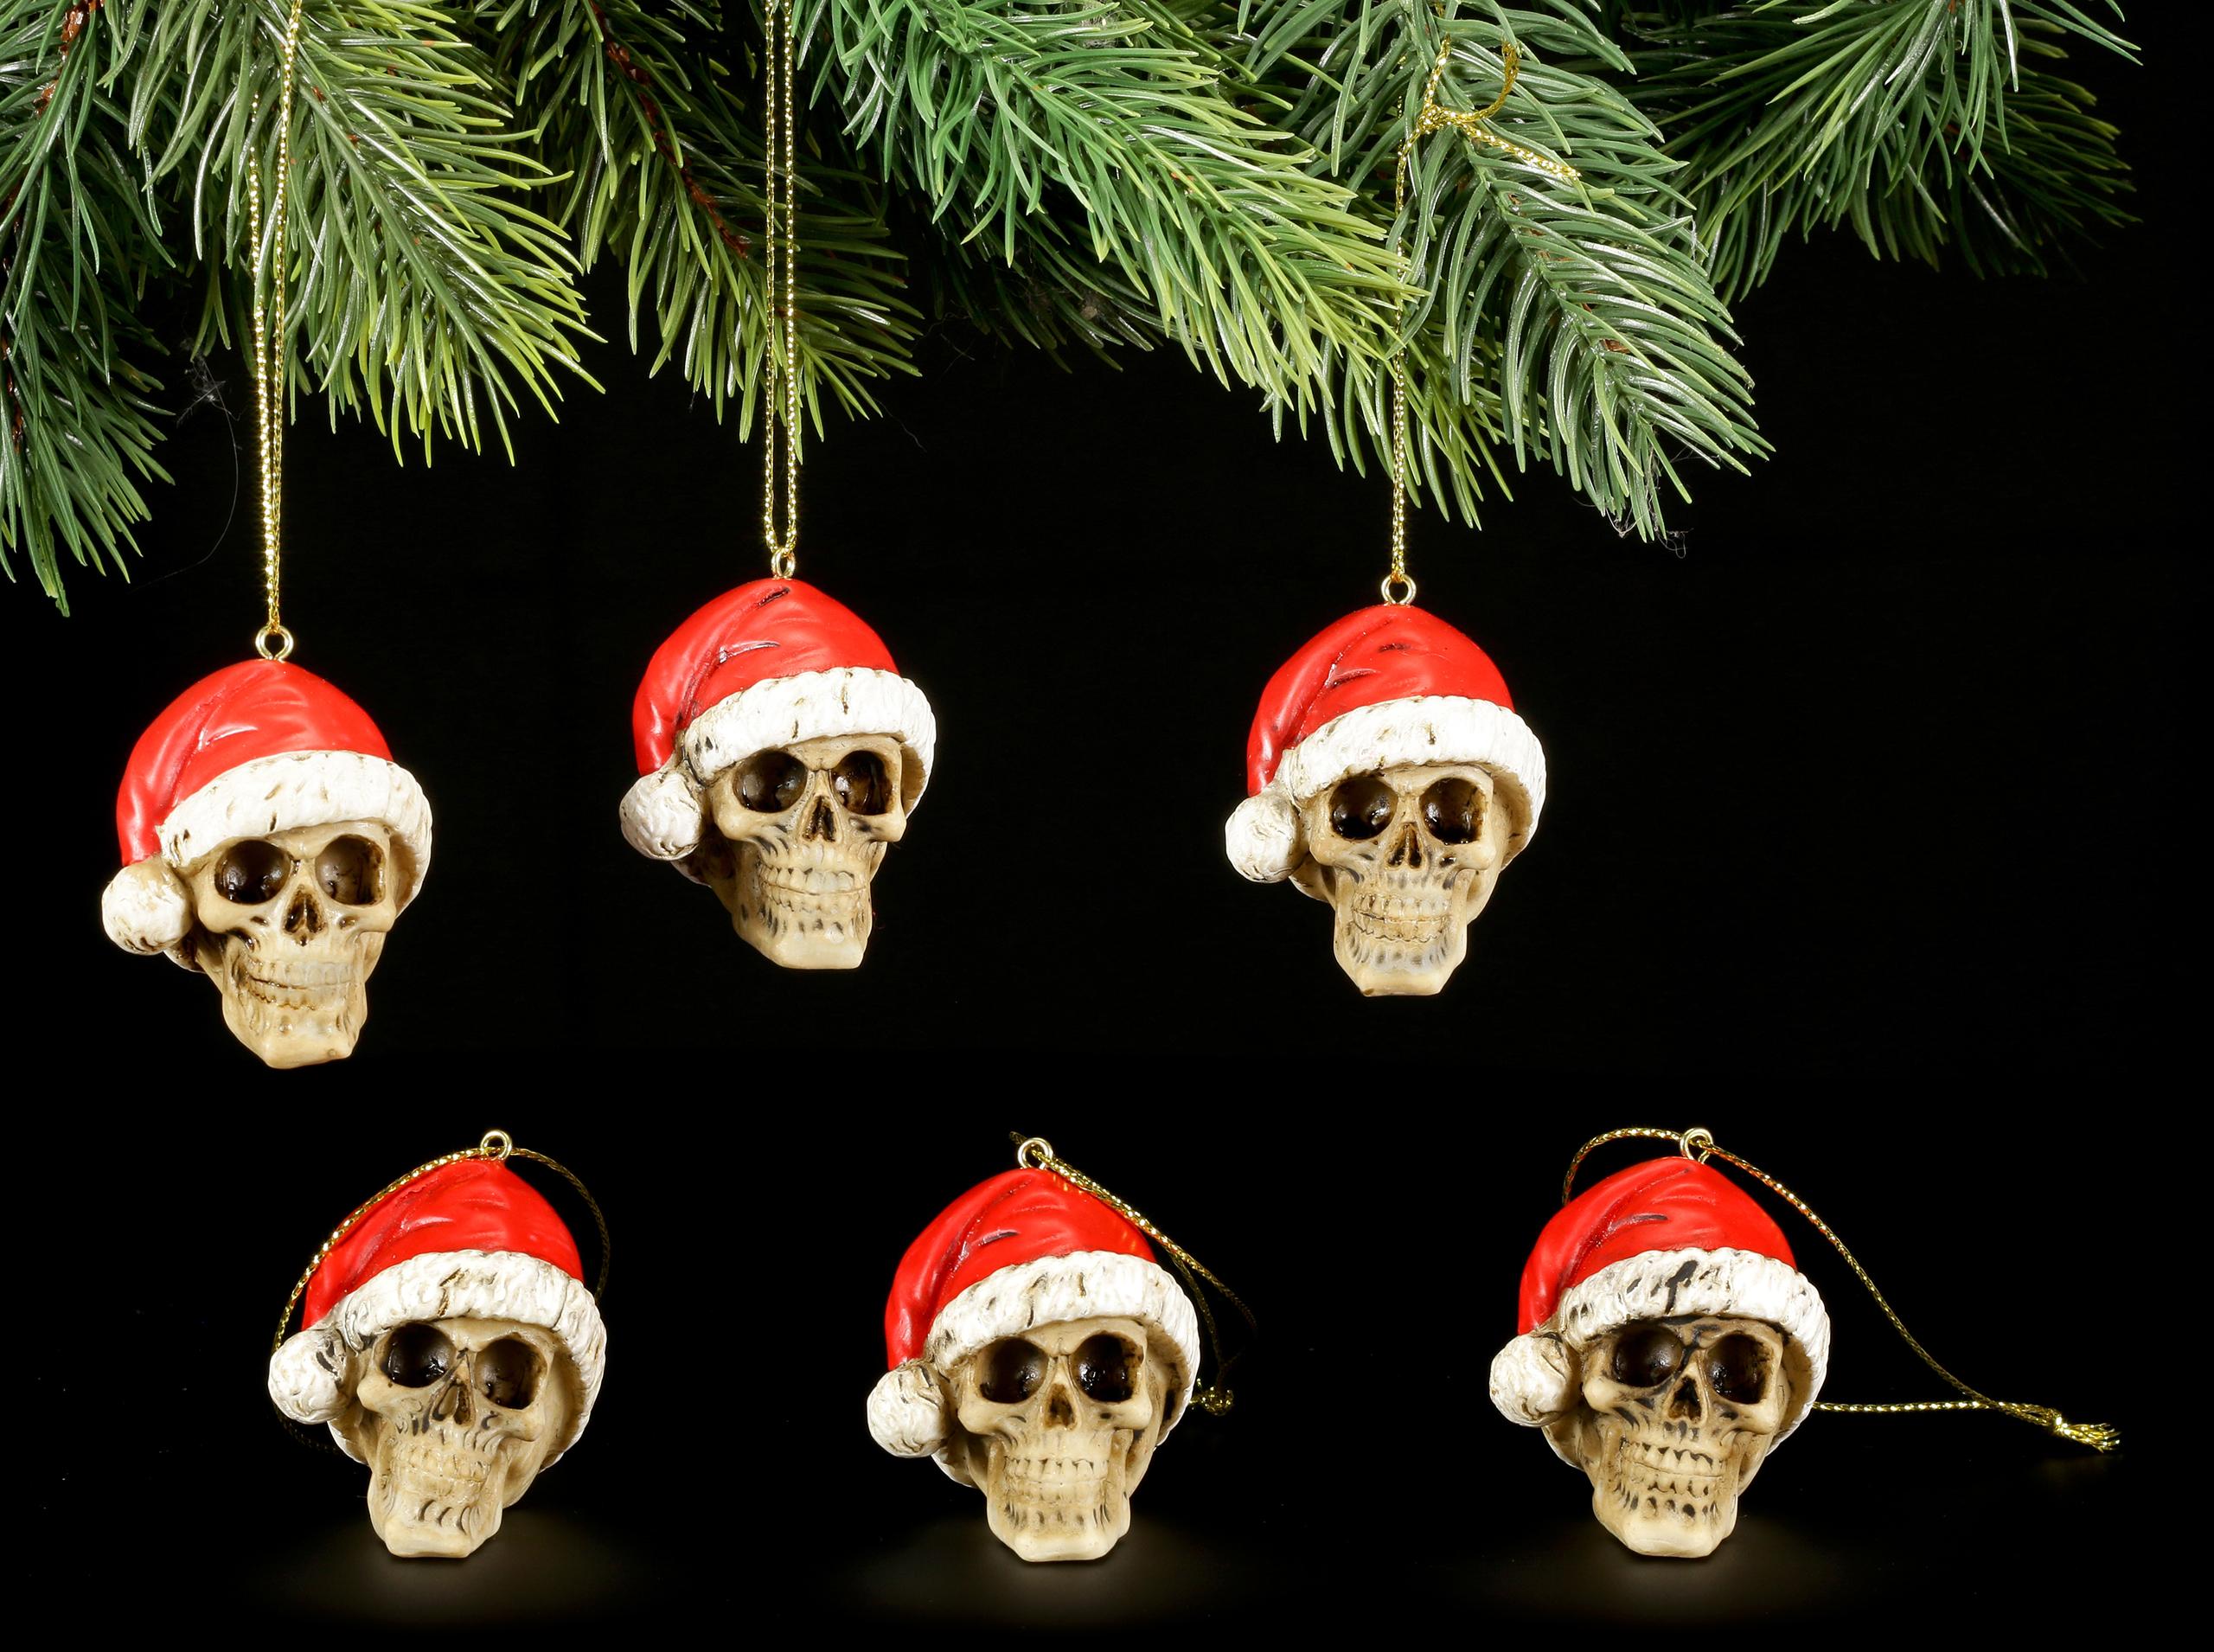 Material Christbaumkugeln.Christmas Tree Decorations Set Of 6 Skulls With Santa Hat